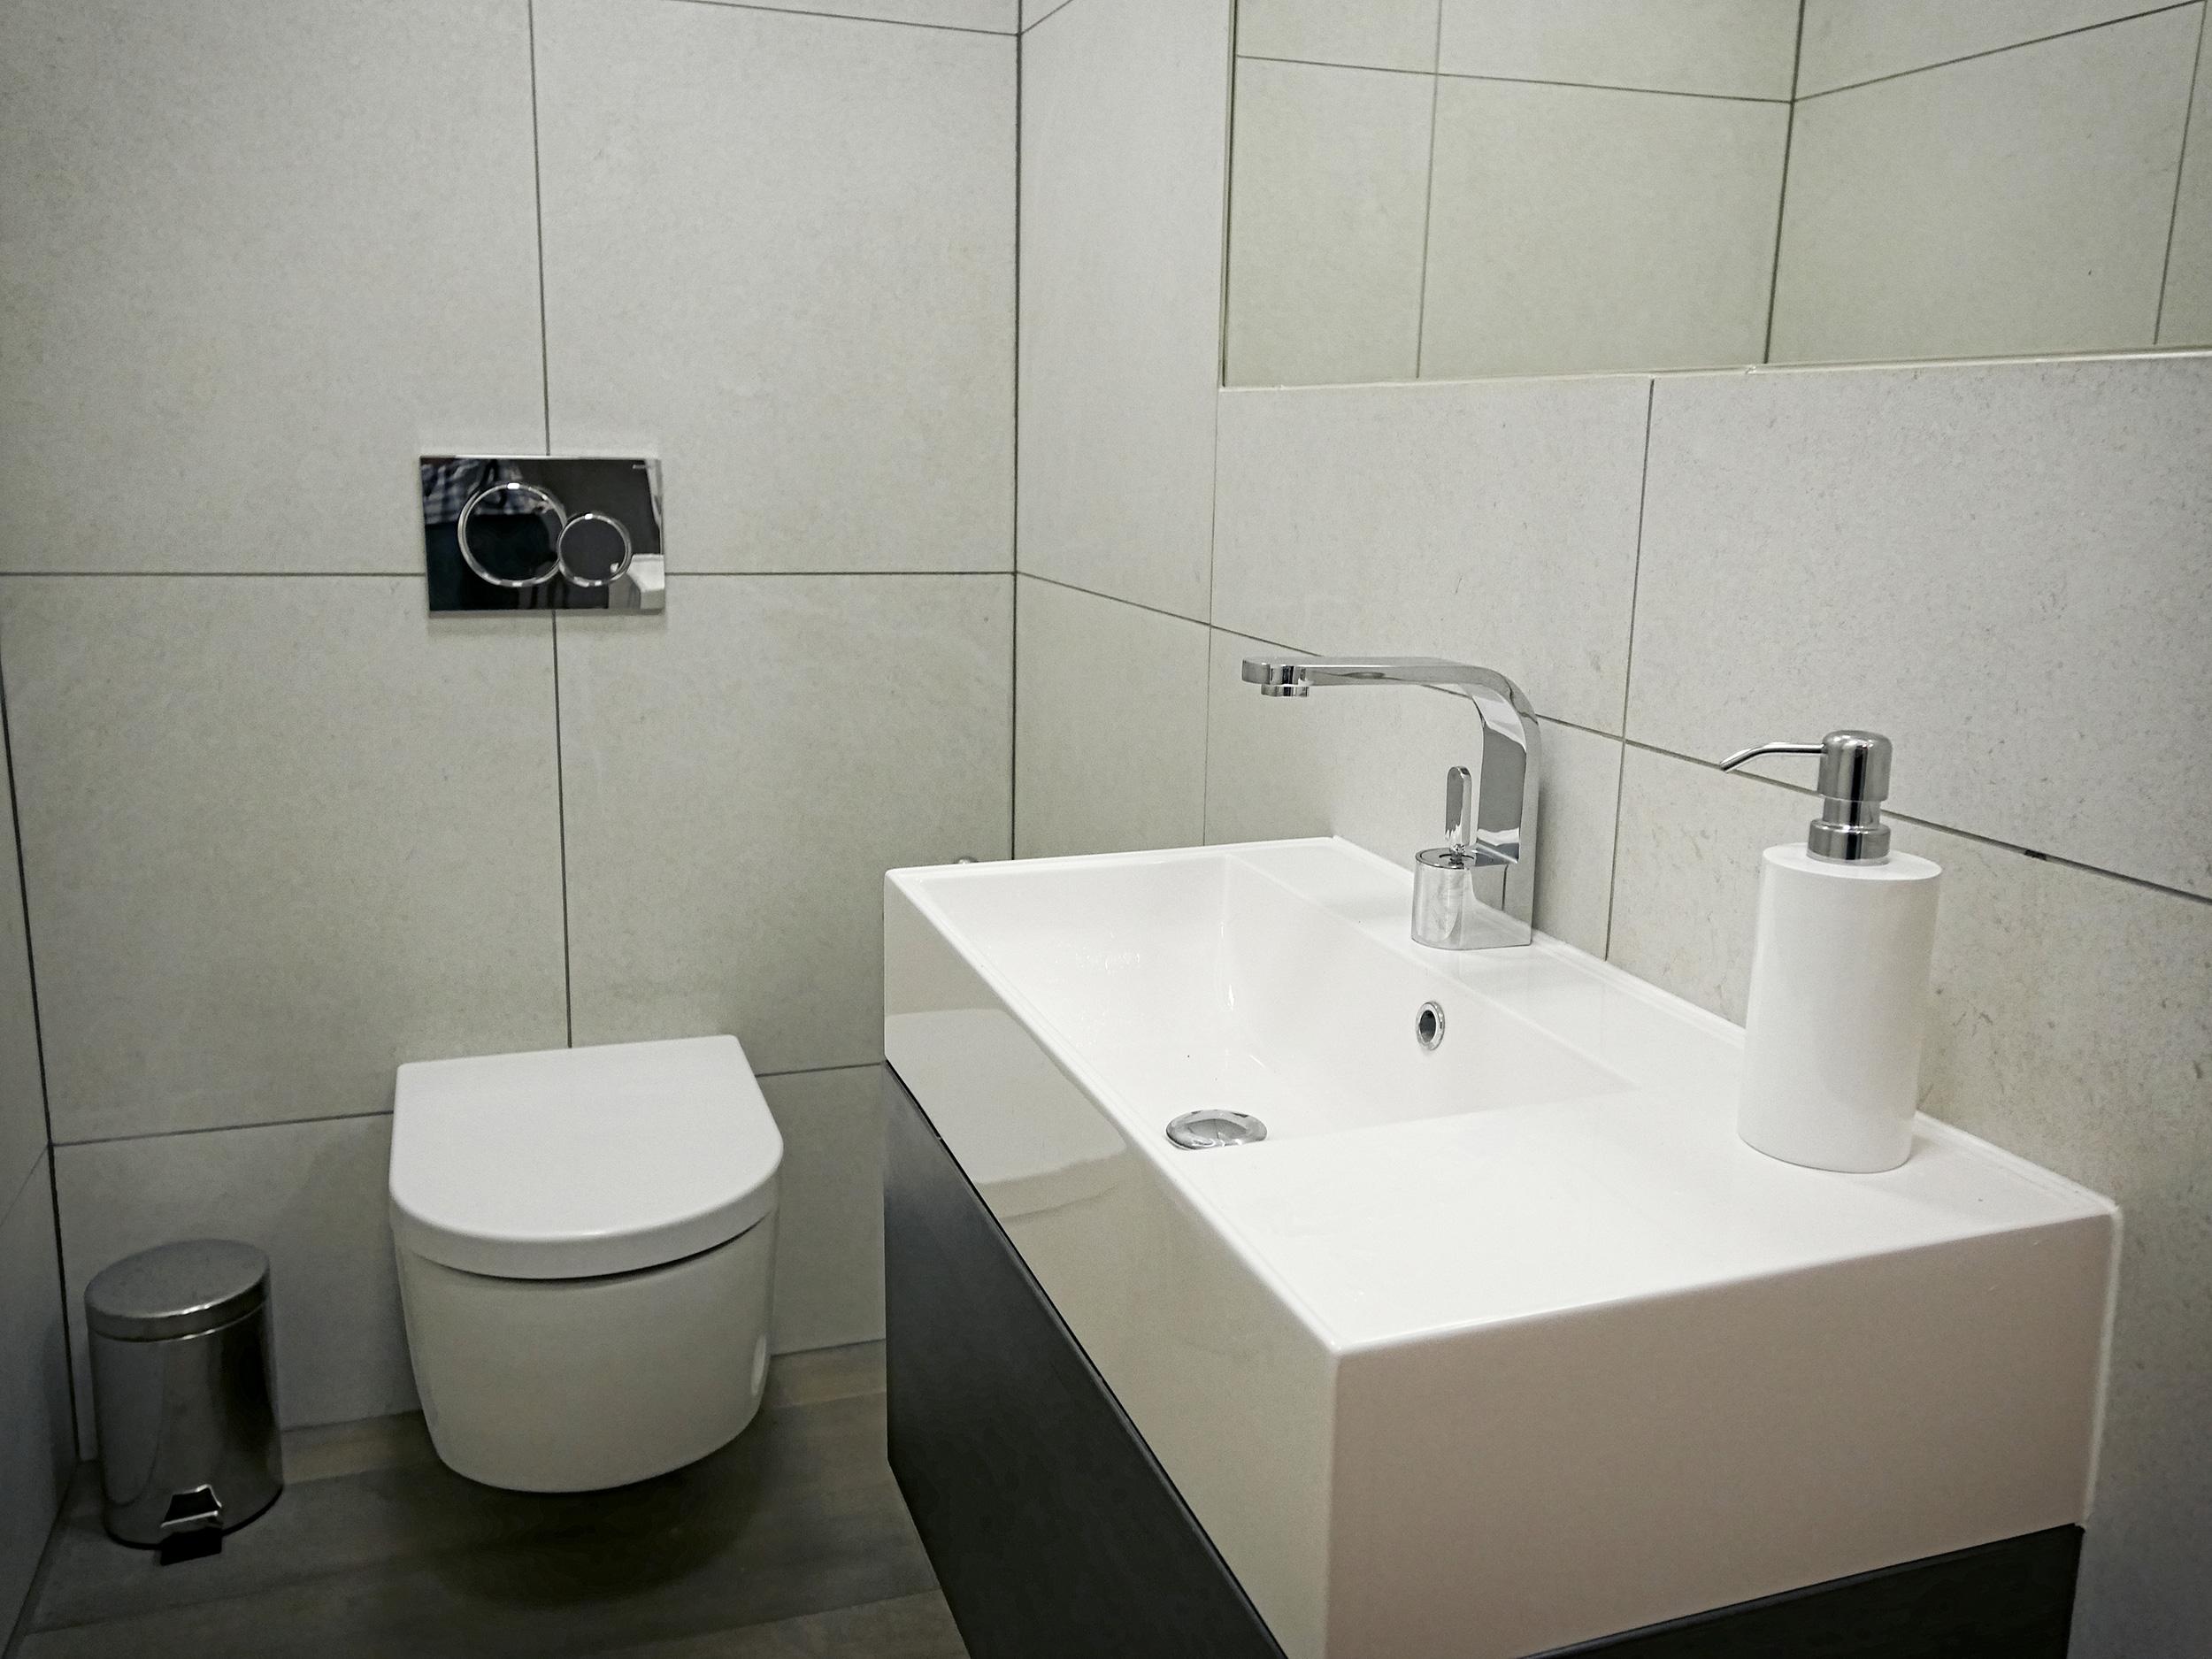 Bathroom in our studio